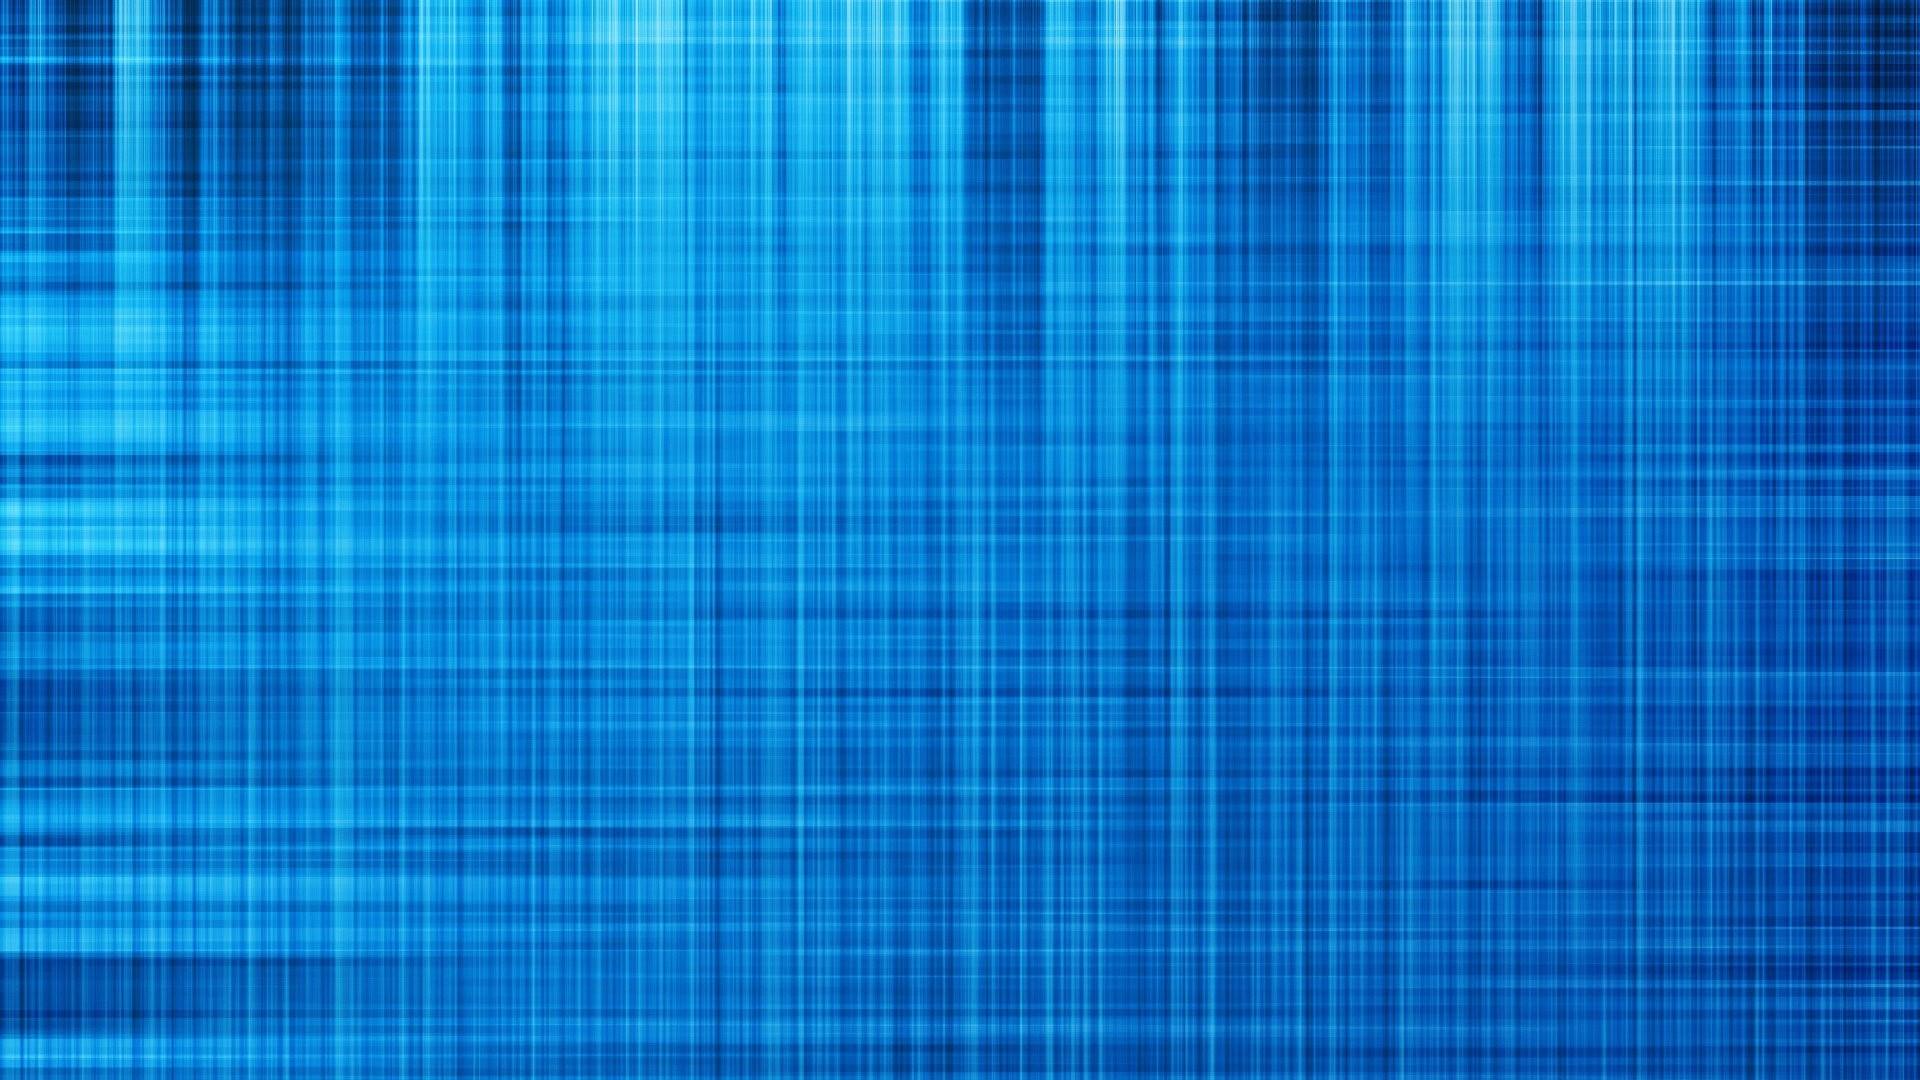 Plain Blue HD Wallpaper